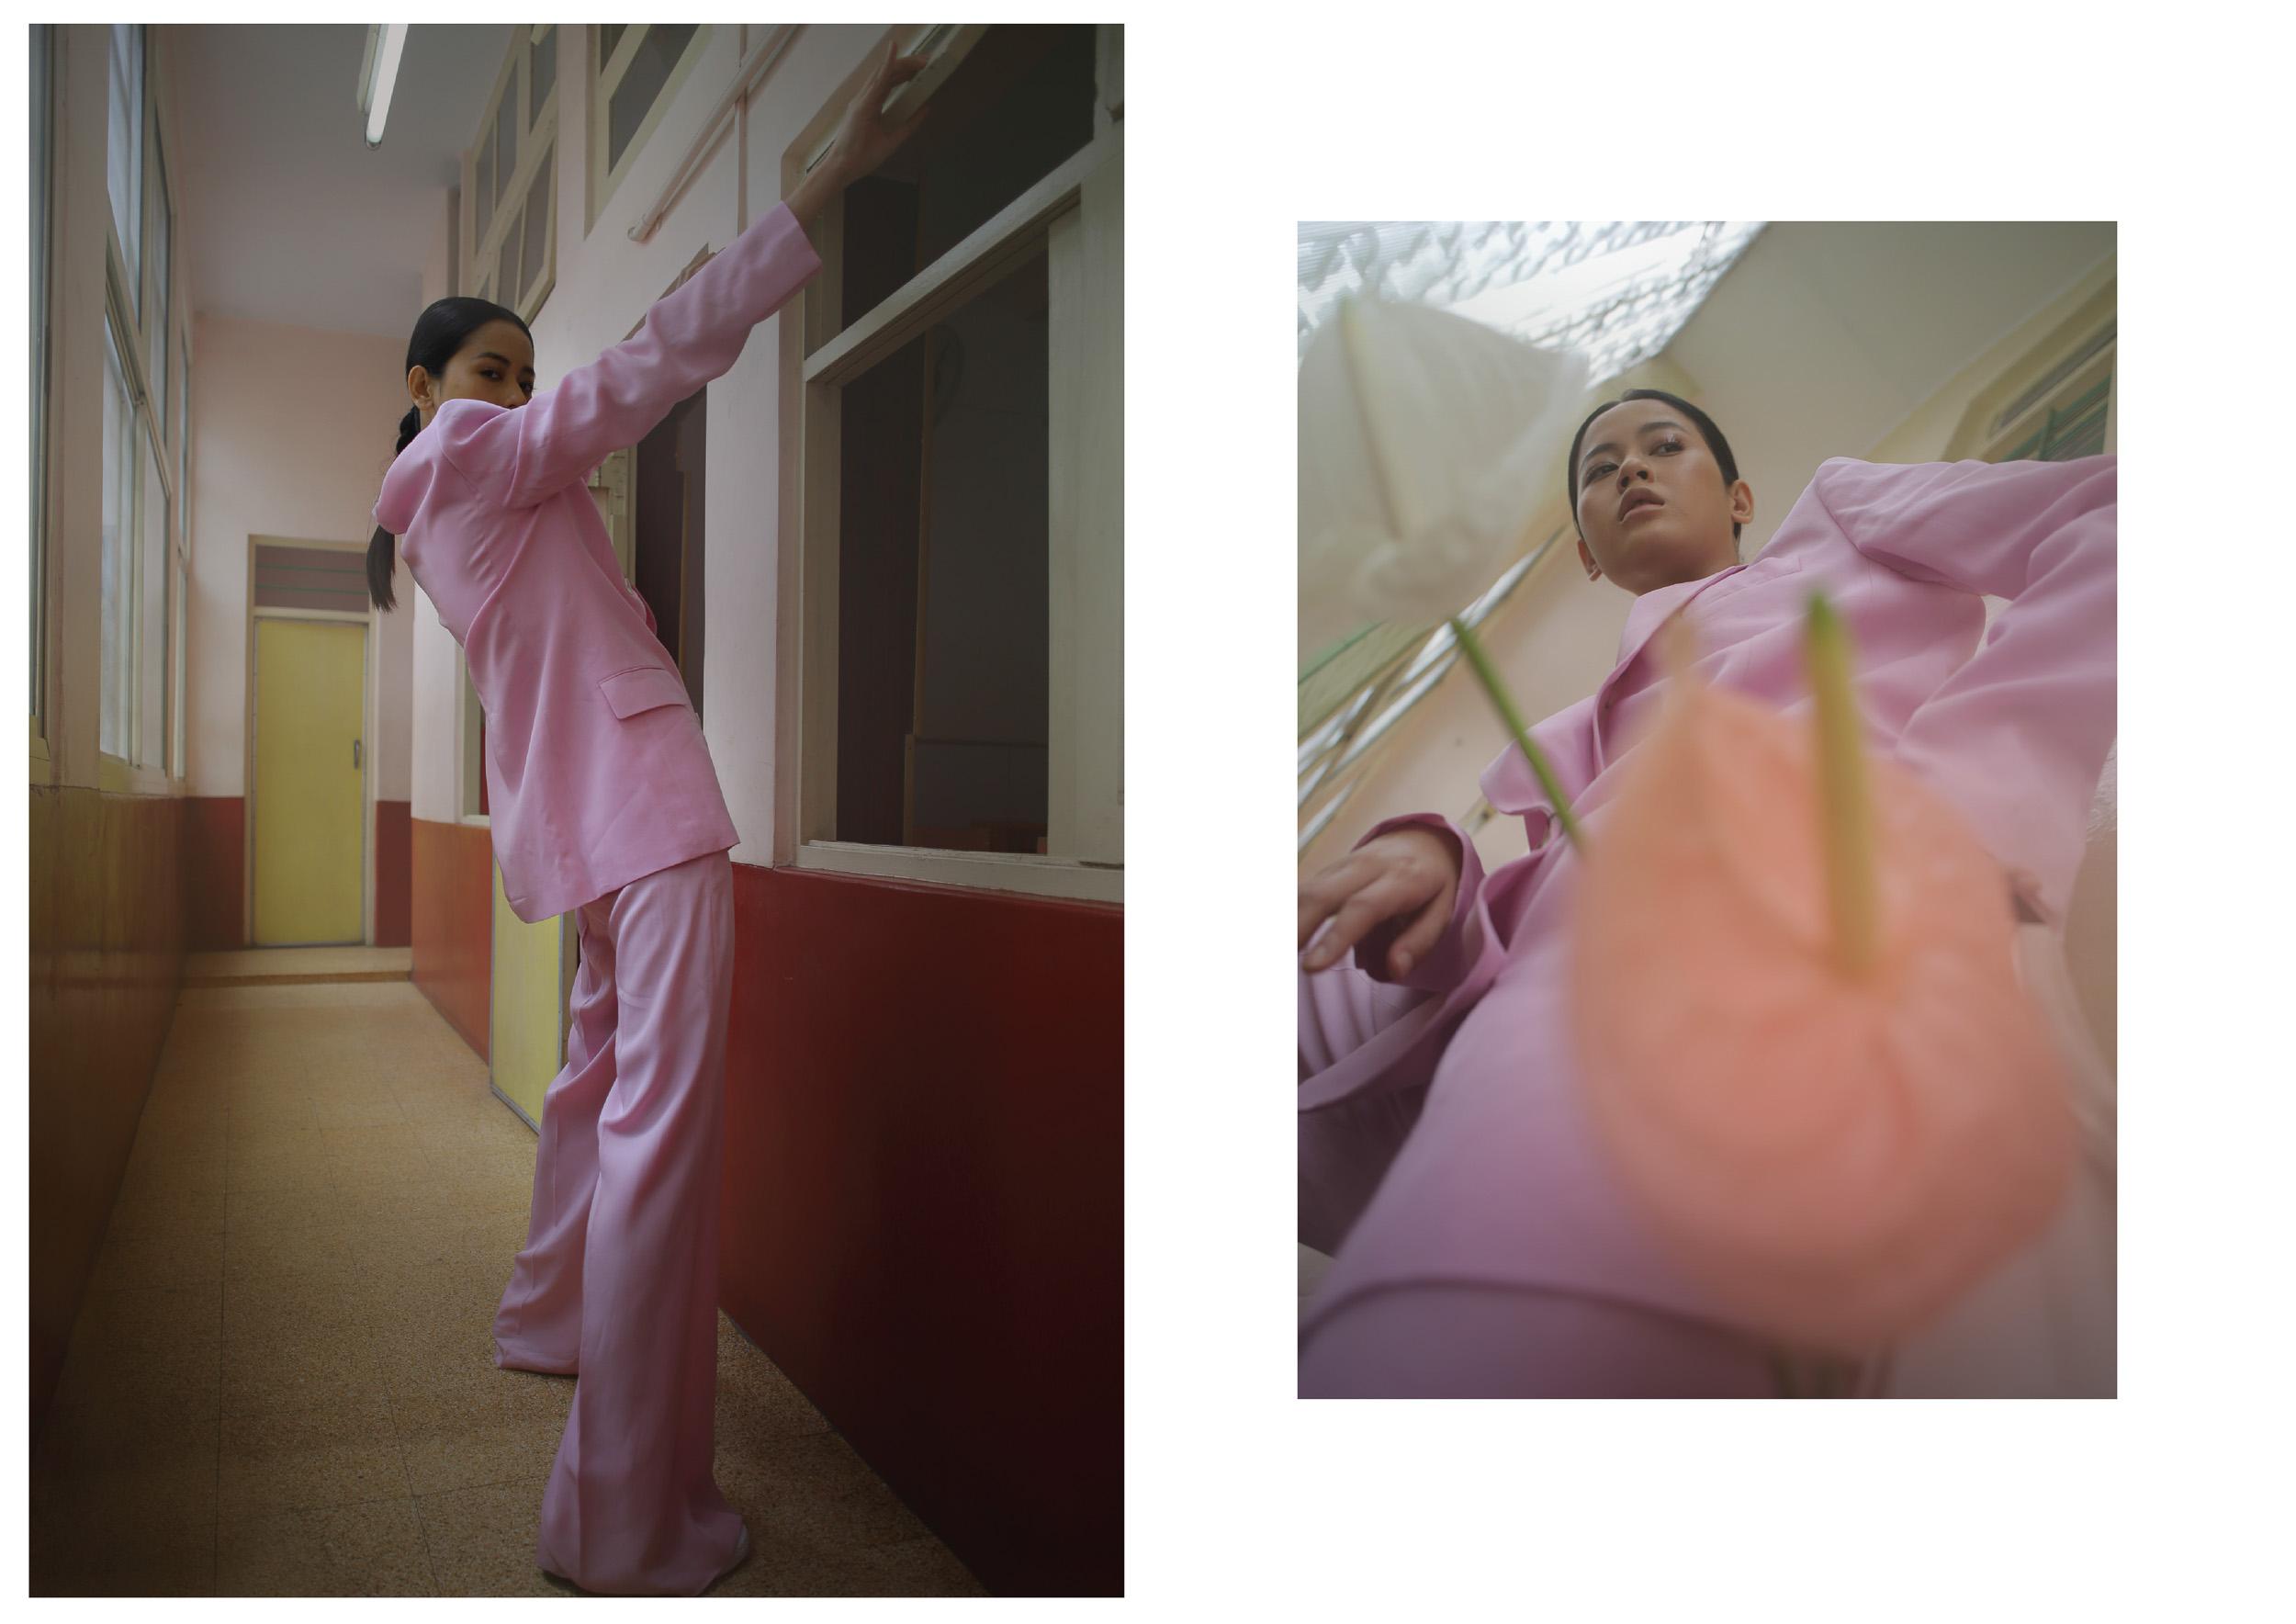 Sindhur_Photography_Fashion_StopTheExcuses-2.JPG